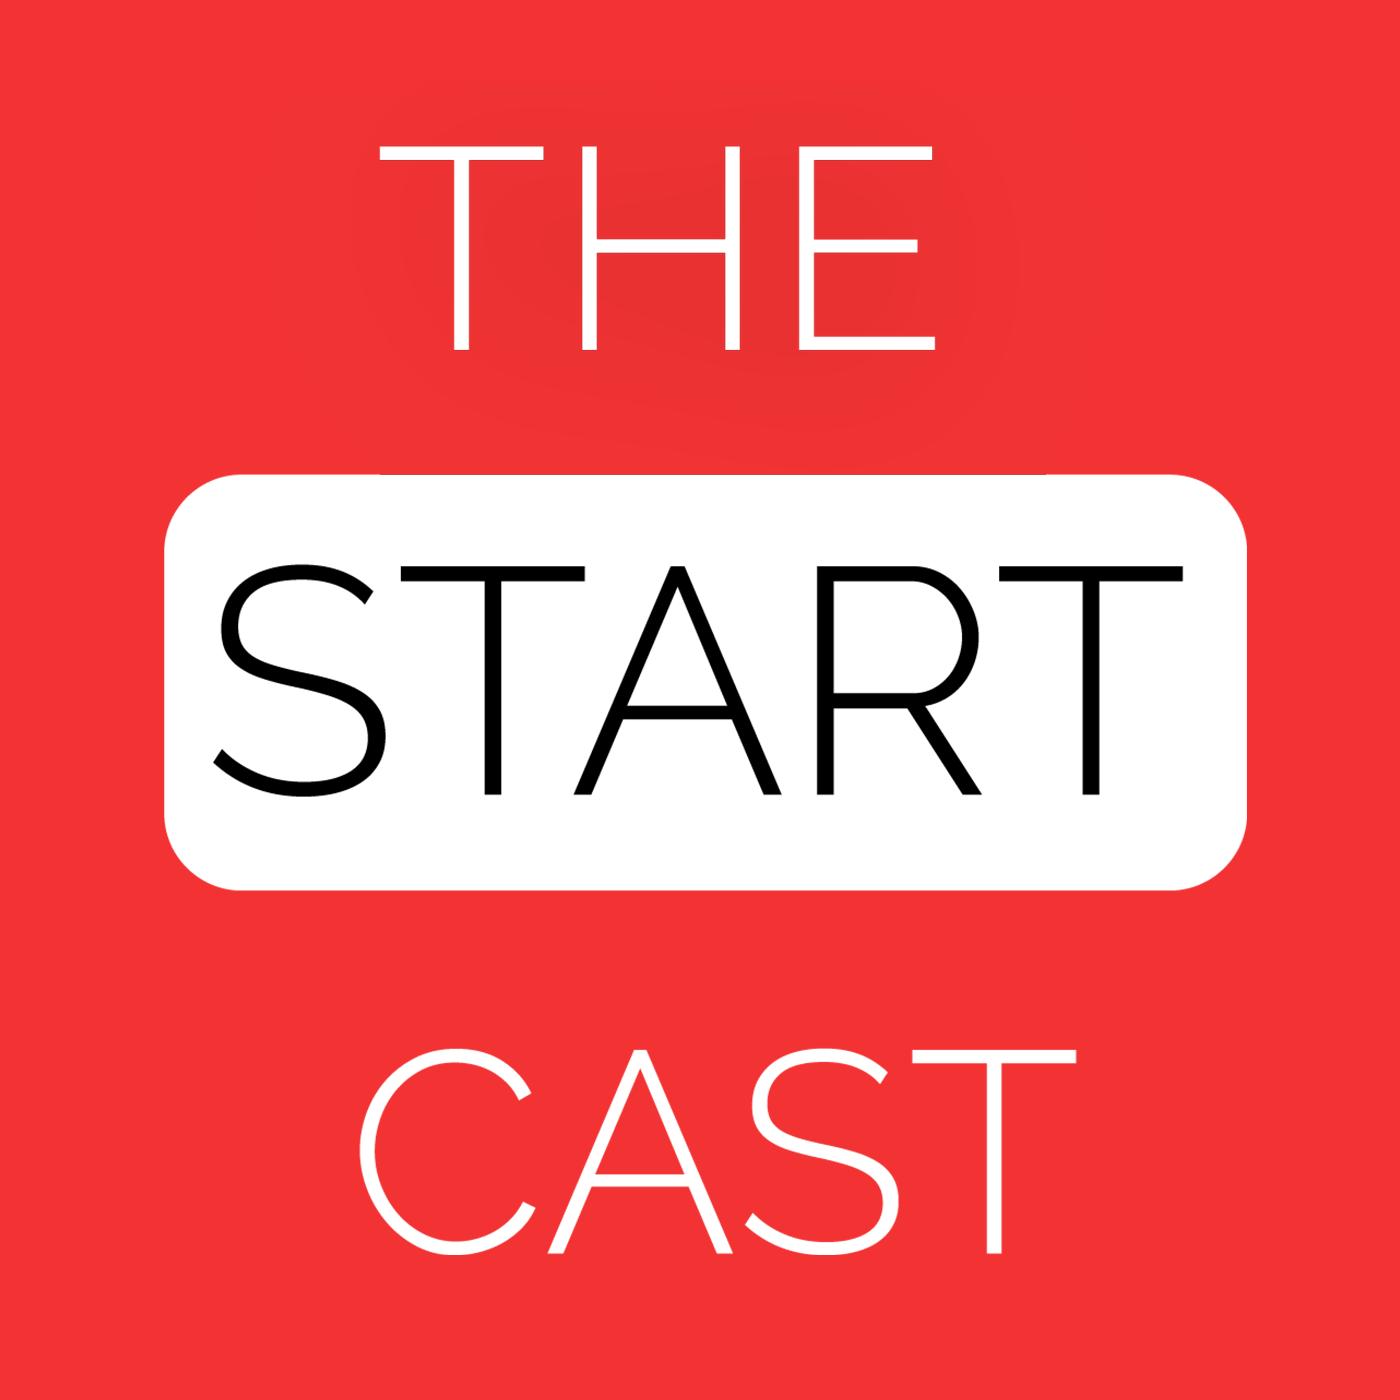 The Start Cast